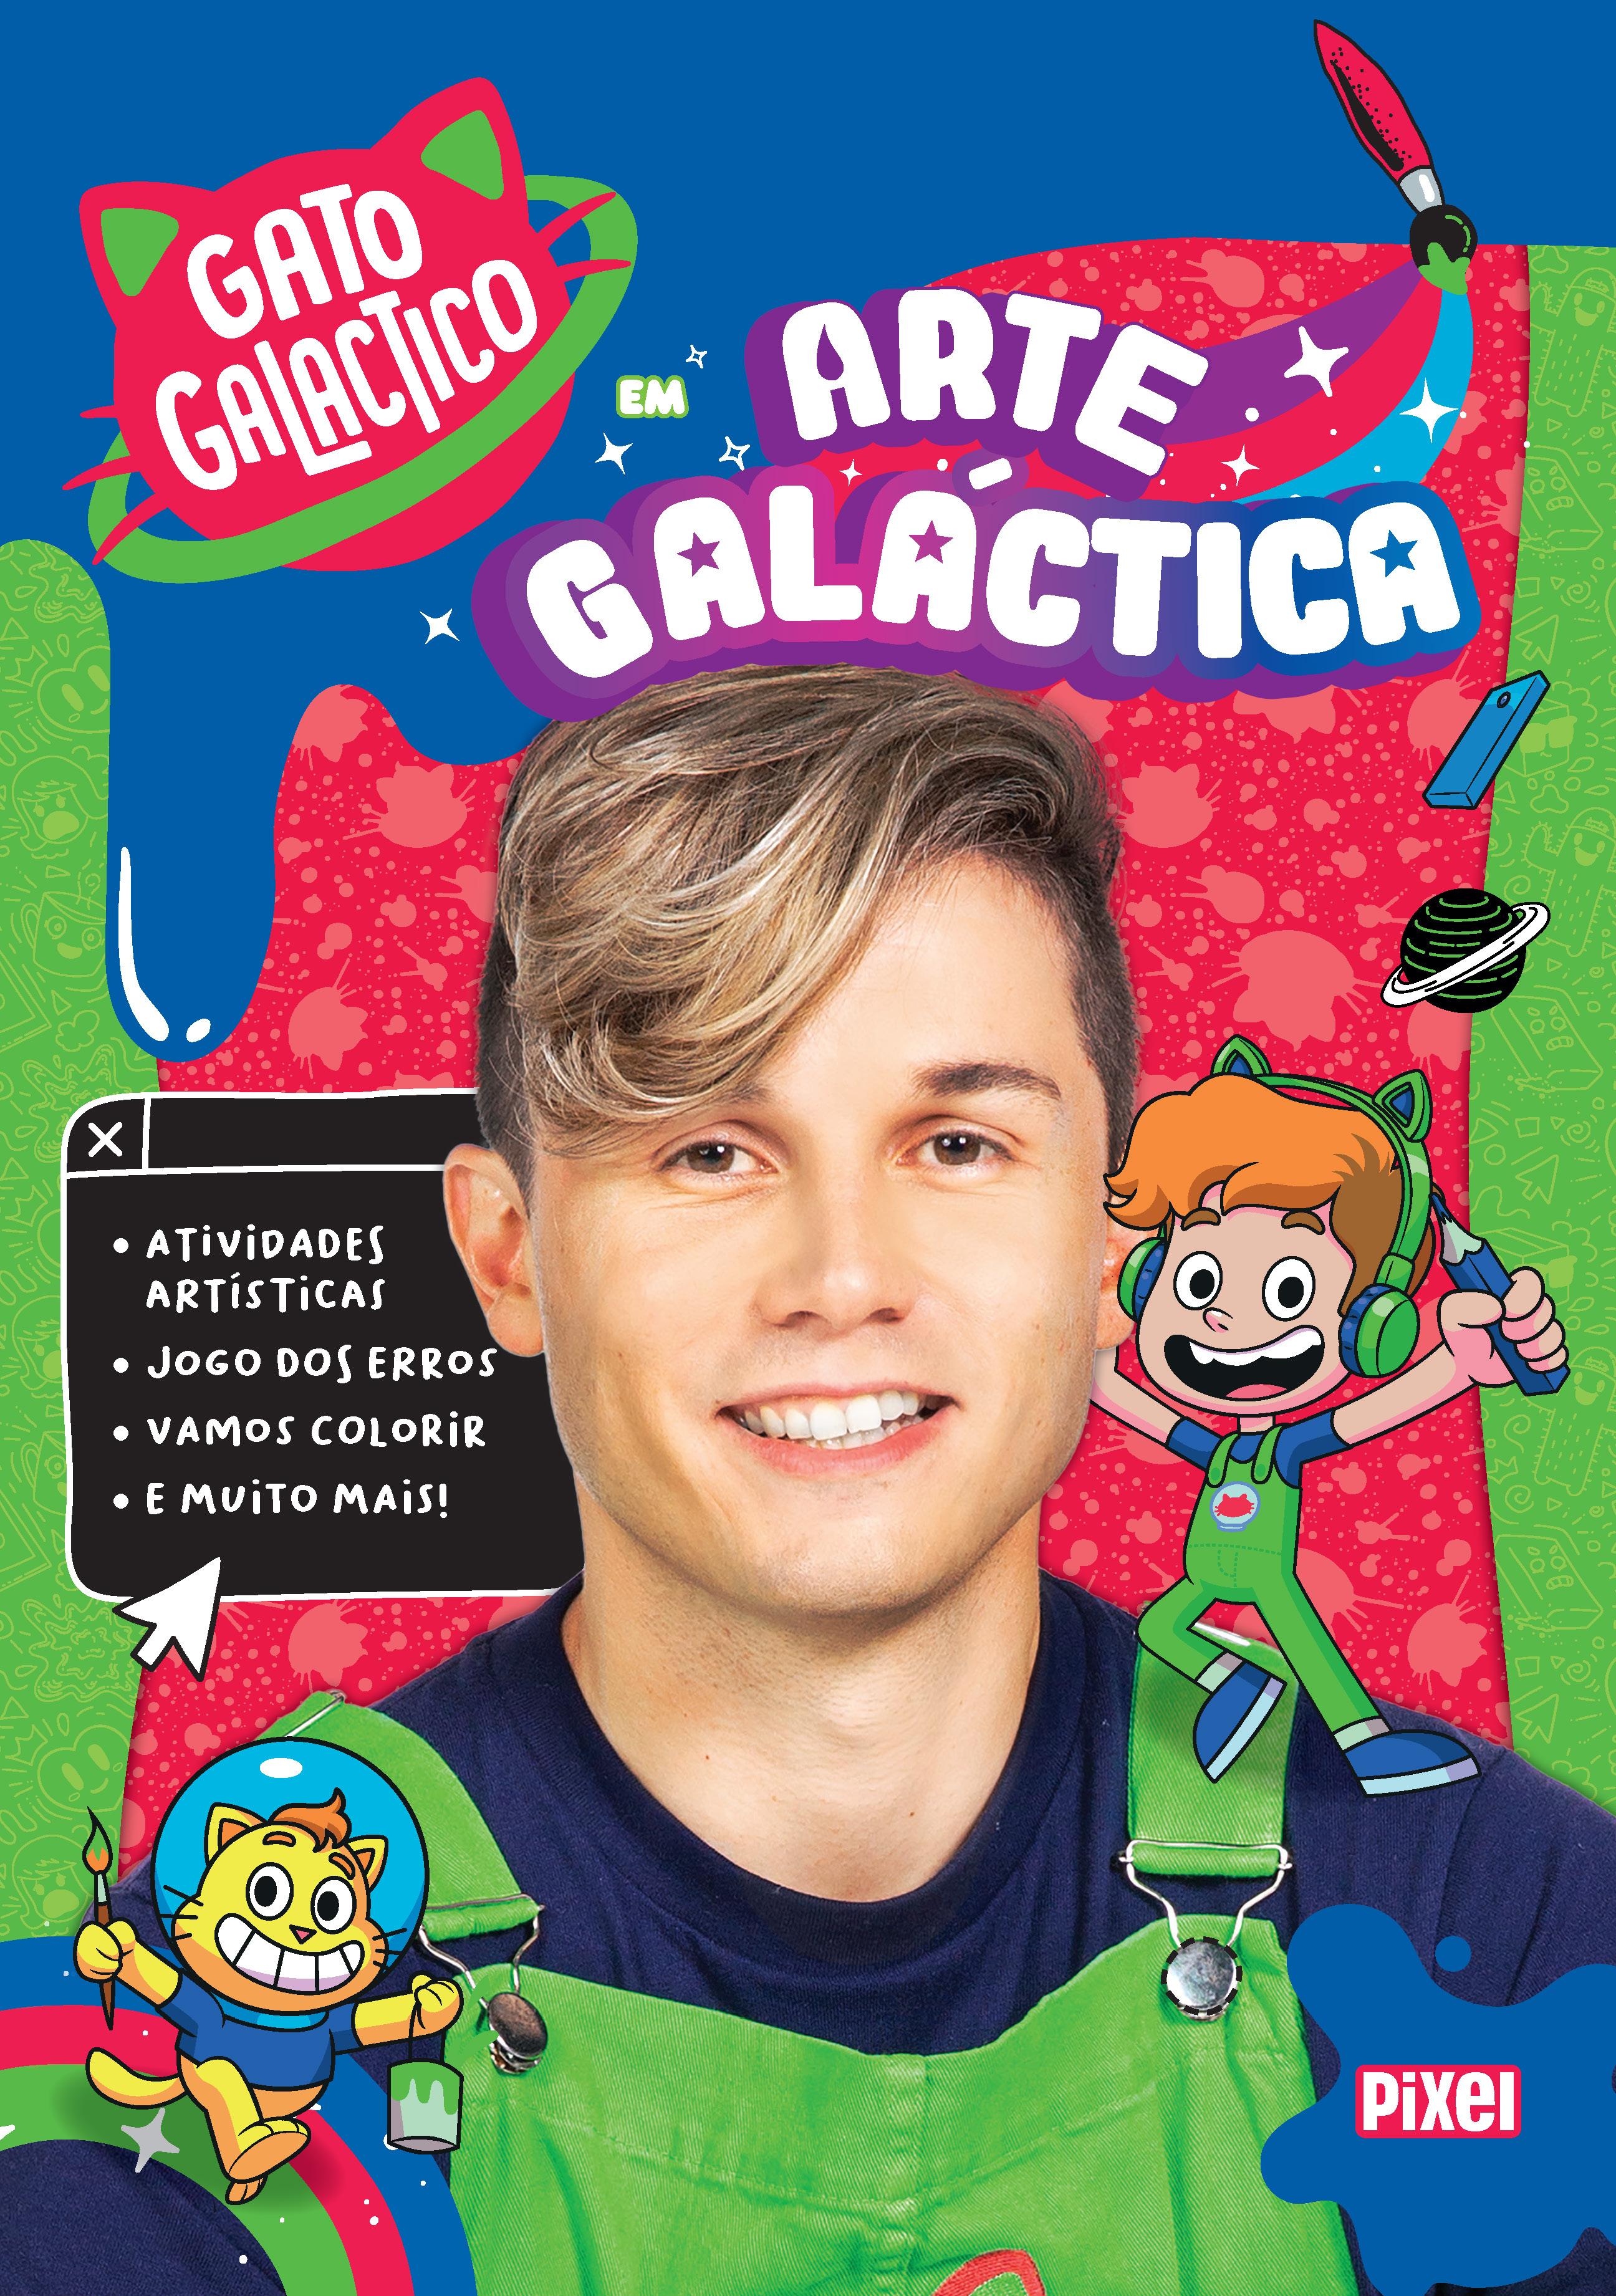 GATO GALACTICO EM ARTE GALACTICA